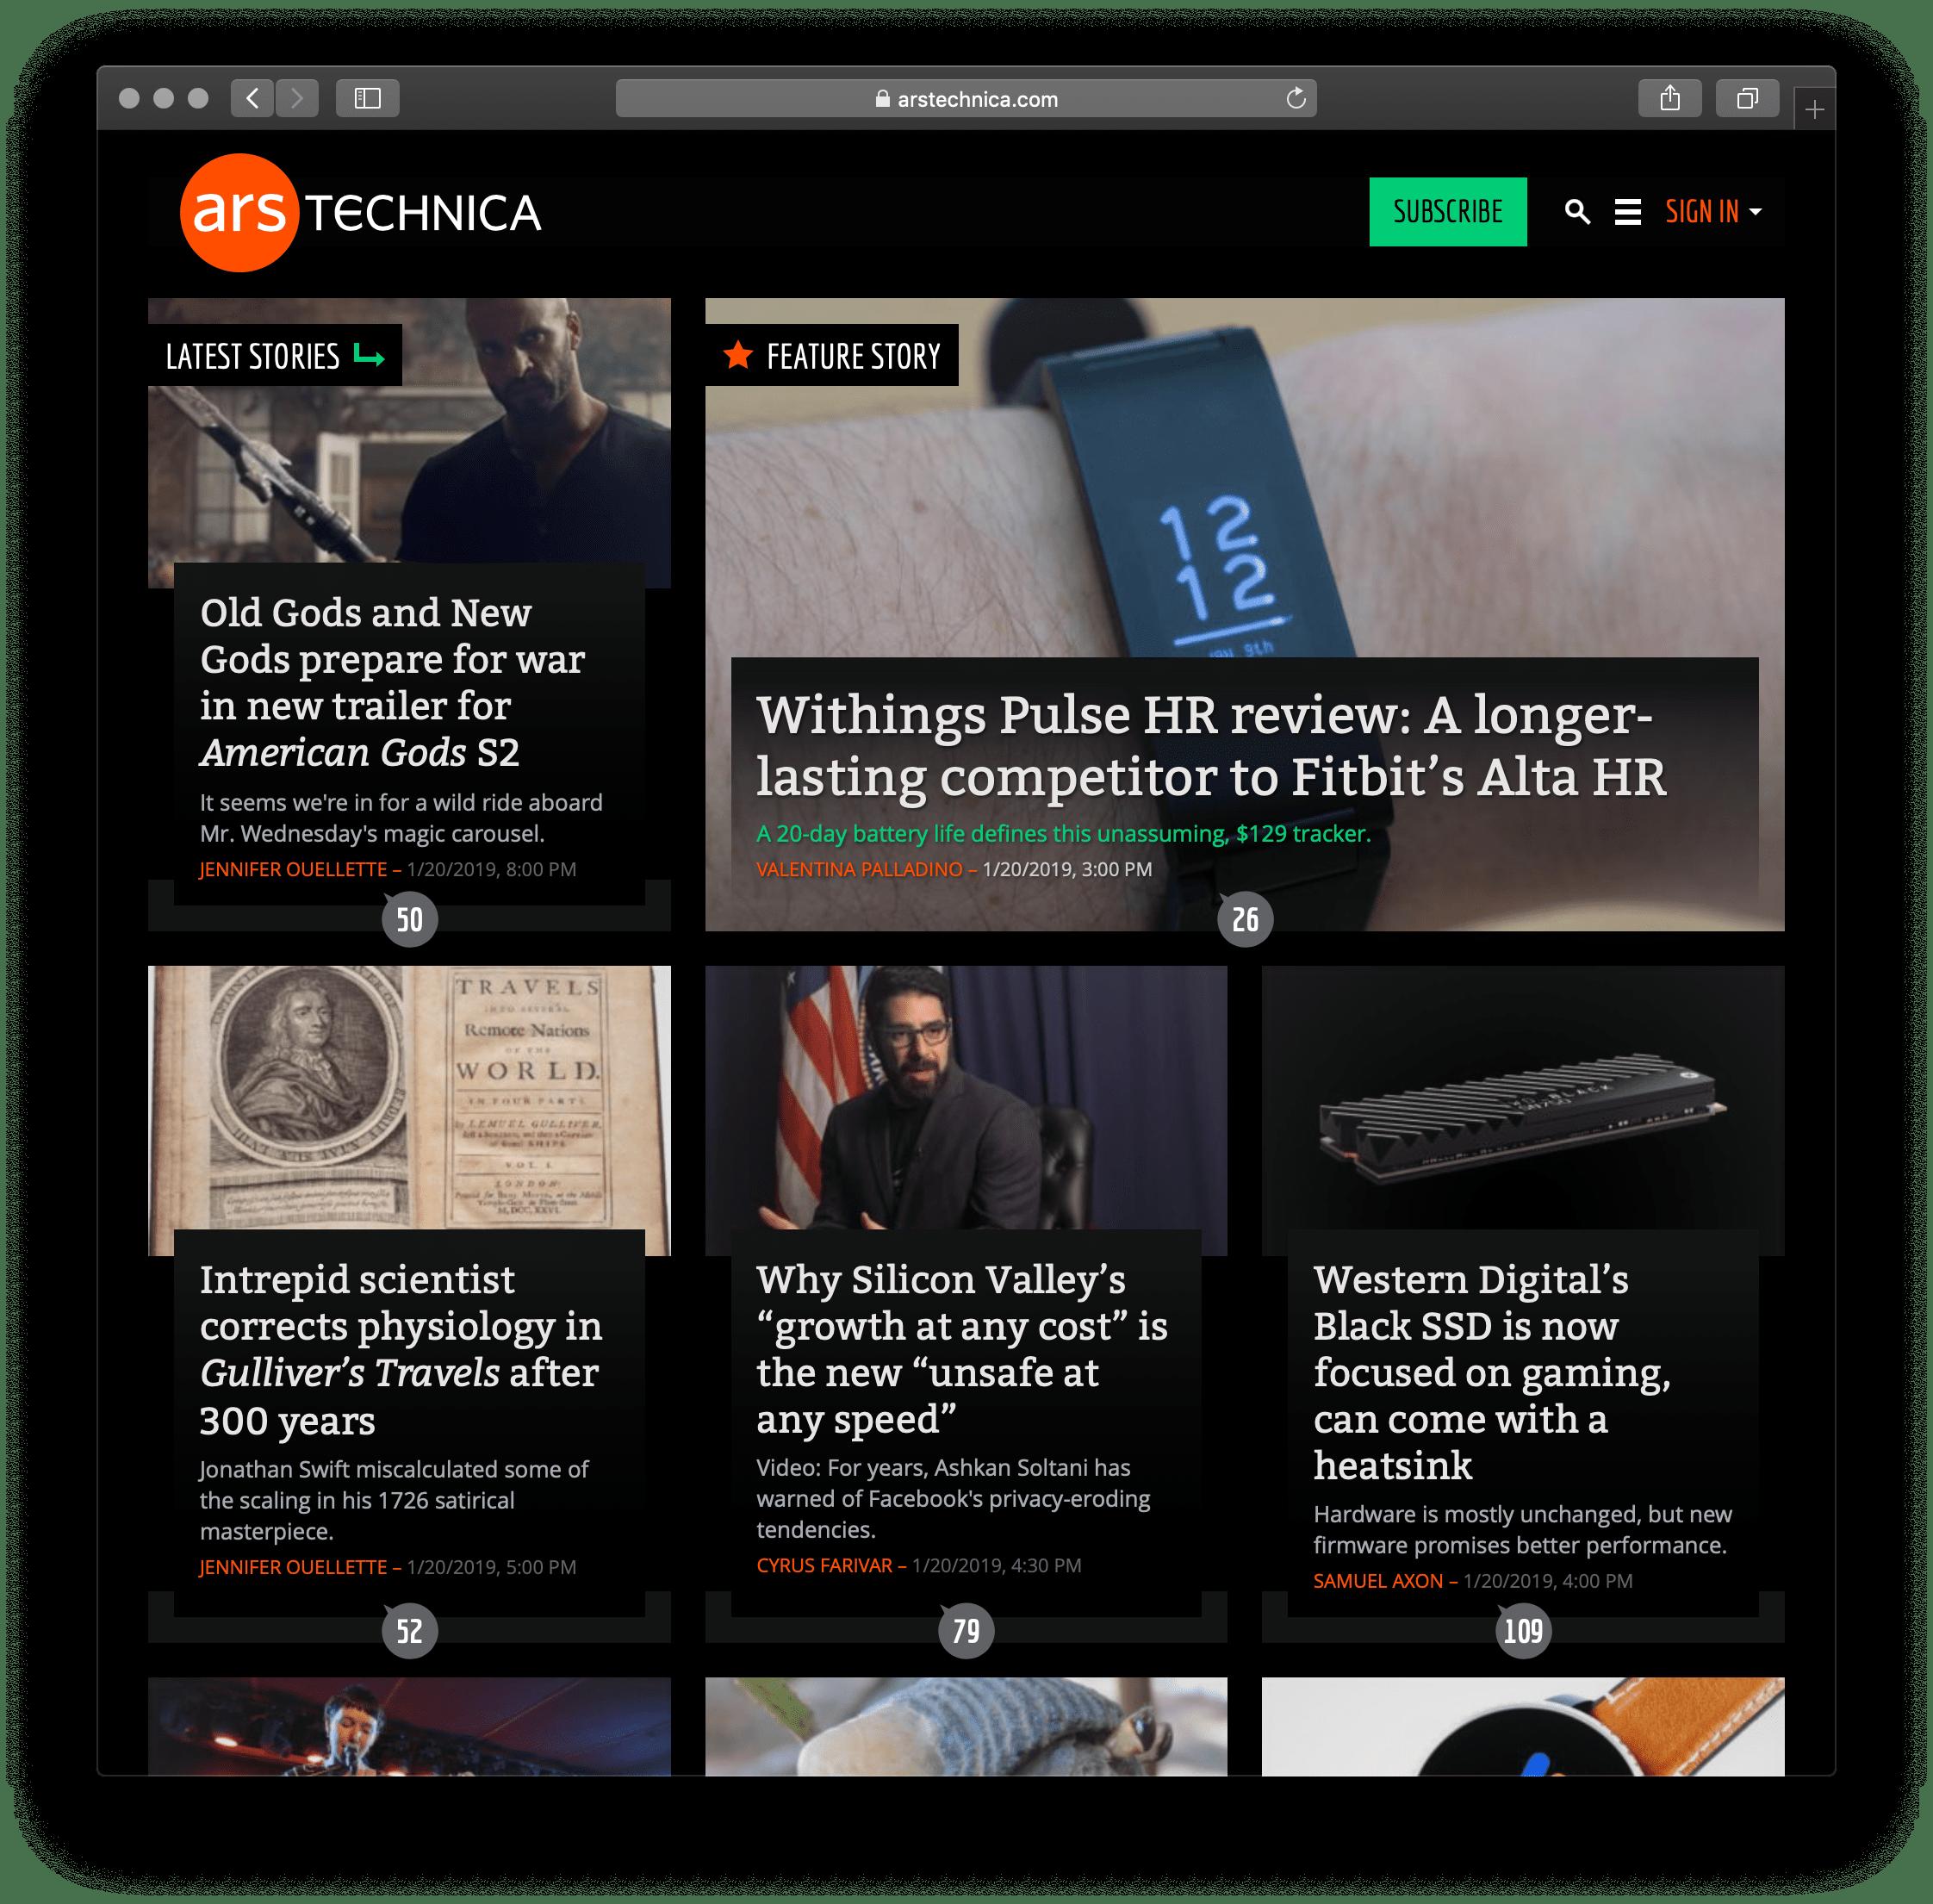 Ars Technica website using the dark theme.